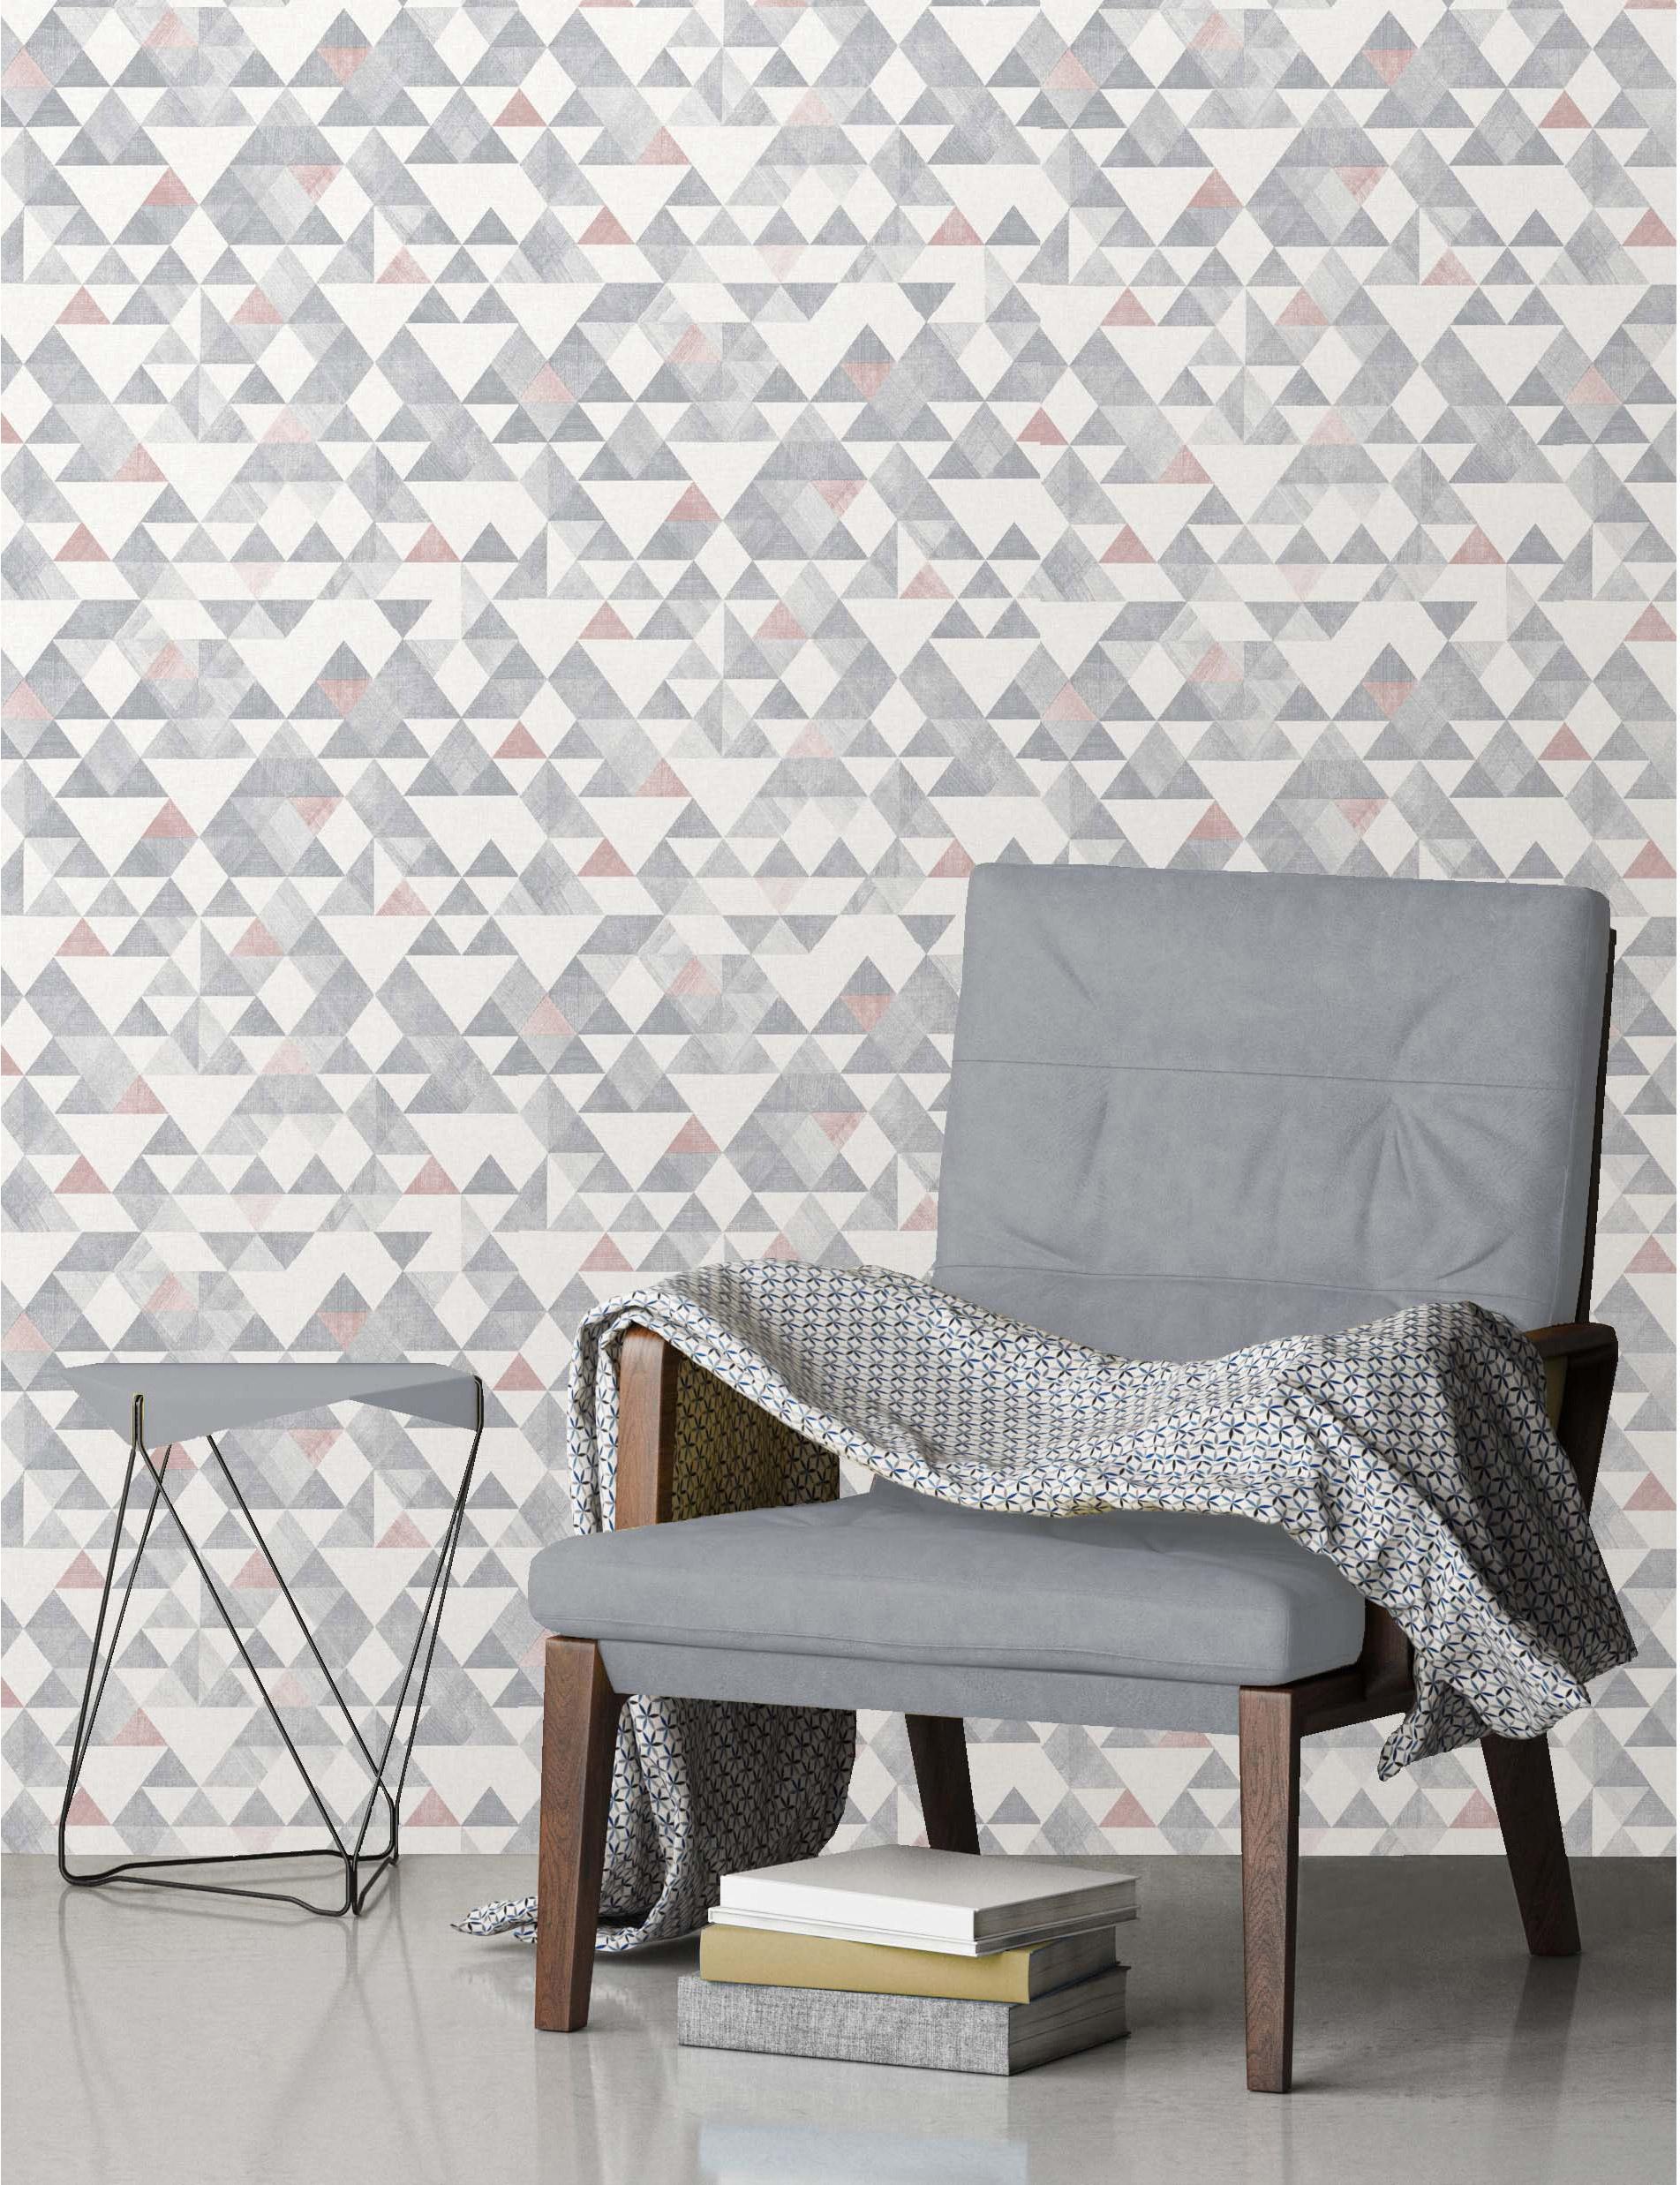 papier peint vinyle triangle tribal rose et gris leroy merlin. Black Bedroom Furniture Sets. Home Design Ideas